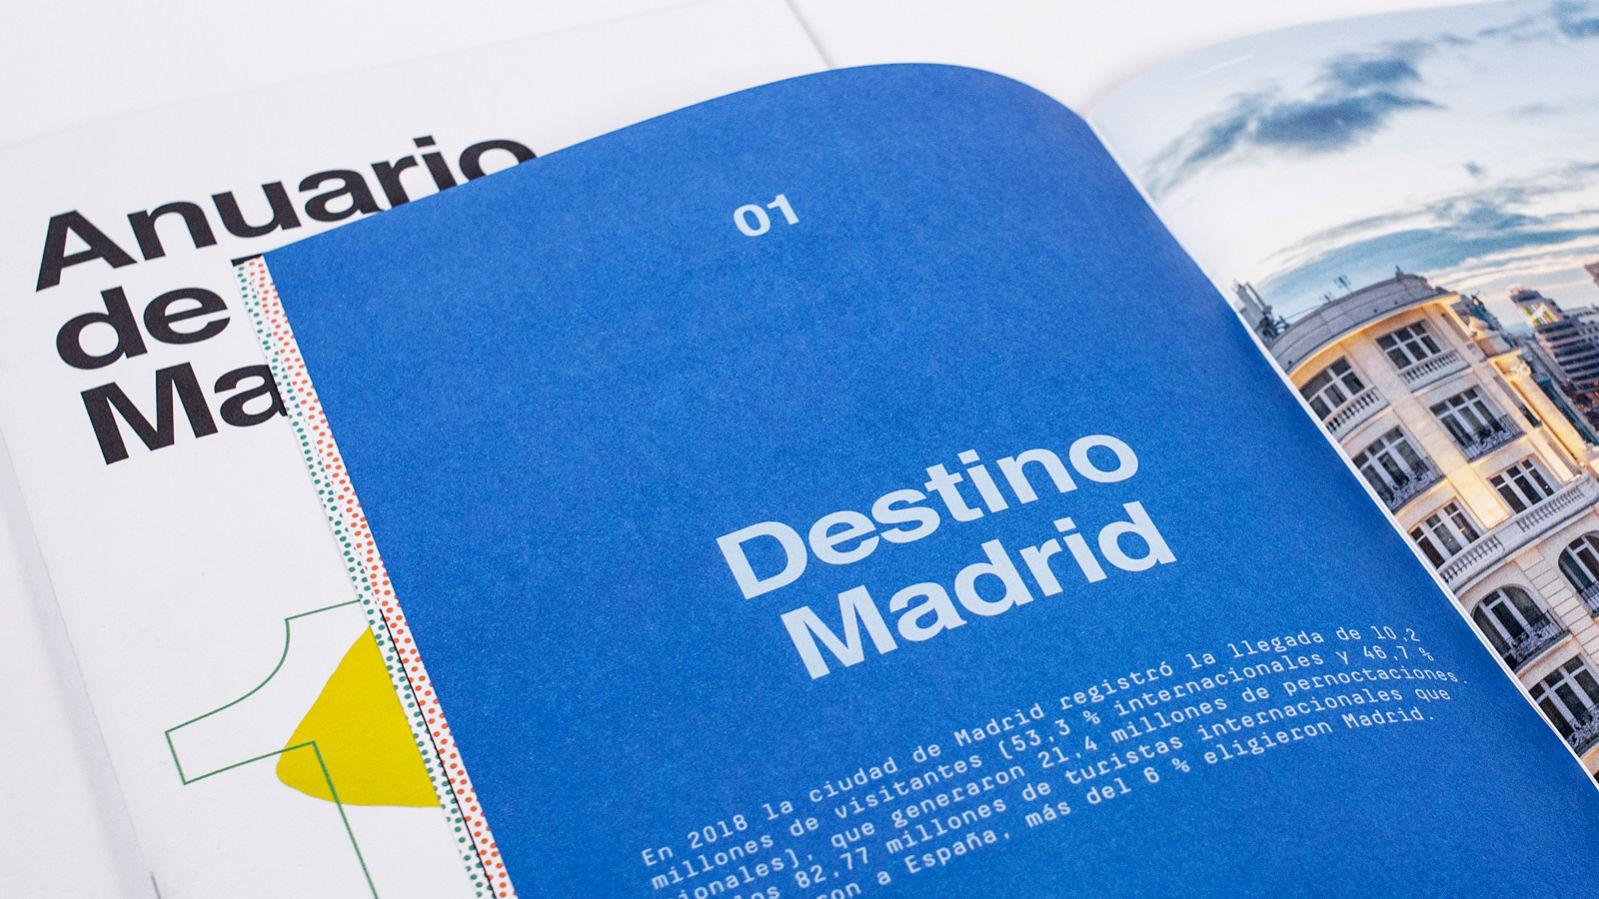 madrid_destino2_1600x900